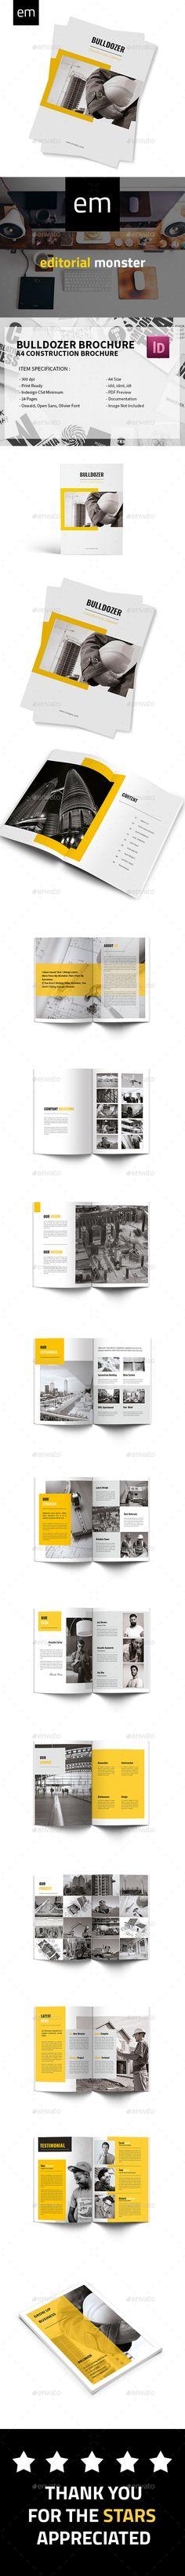 Bulldozer - A4 Construction Brochure Template - #Corporate #Brochures Download here: https://graphicriver.net/item/bulldozer-a4-construction-brochure-template/19510732?ref=alena994